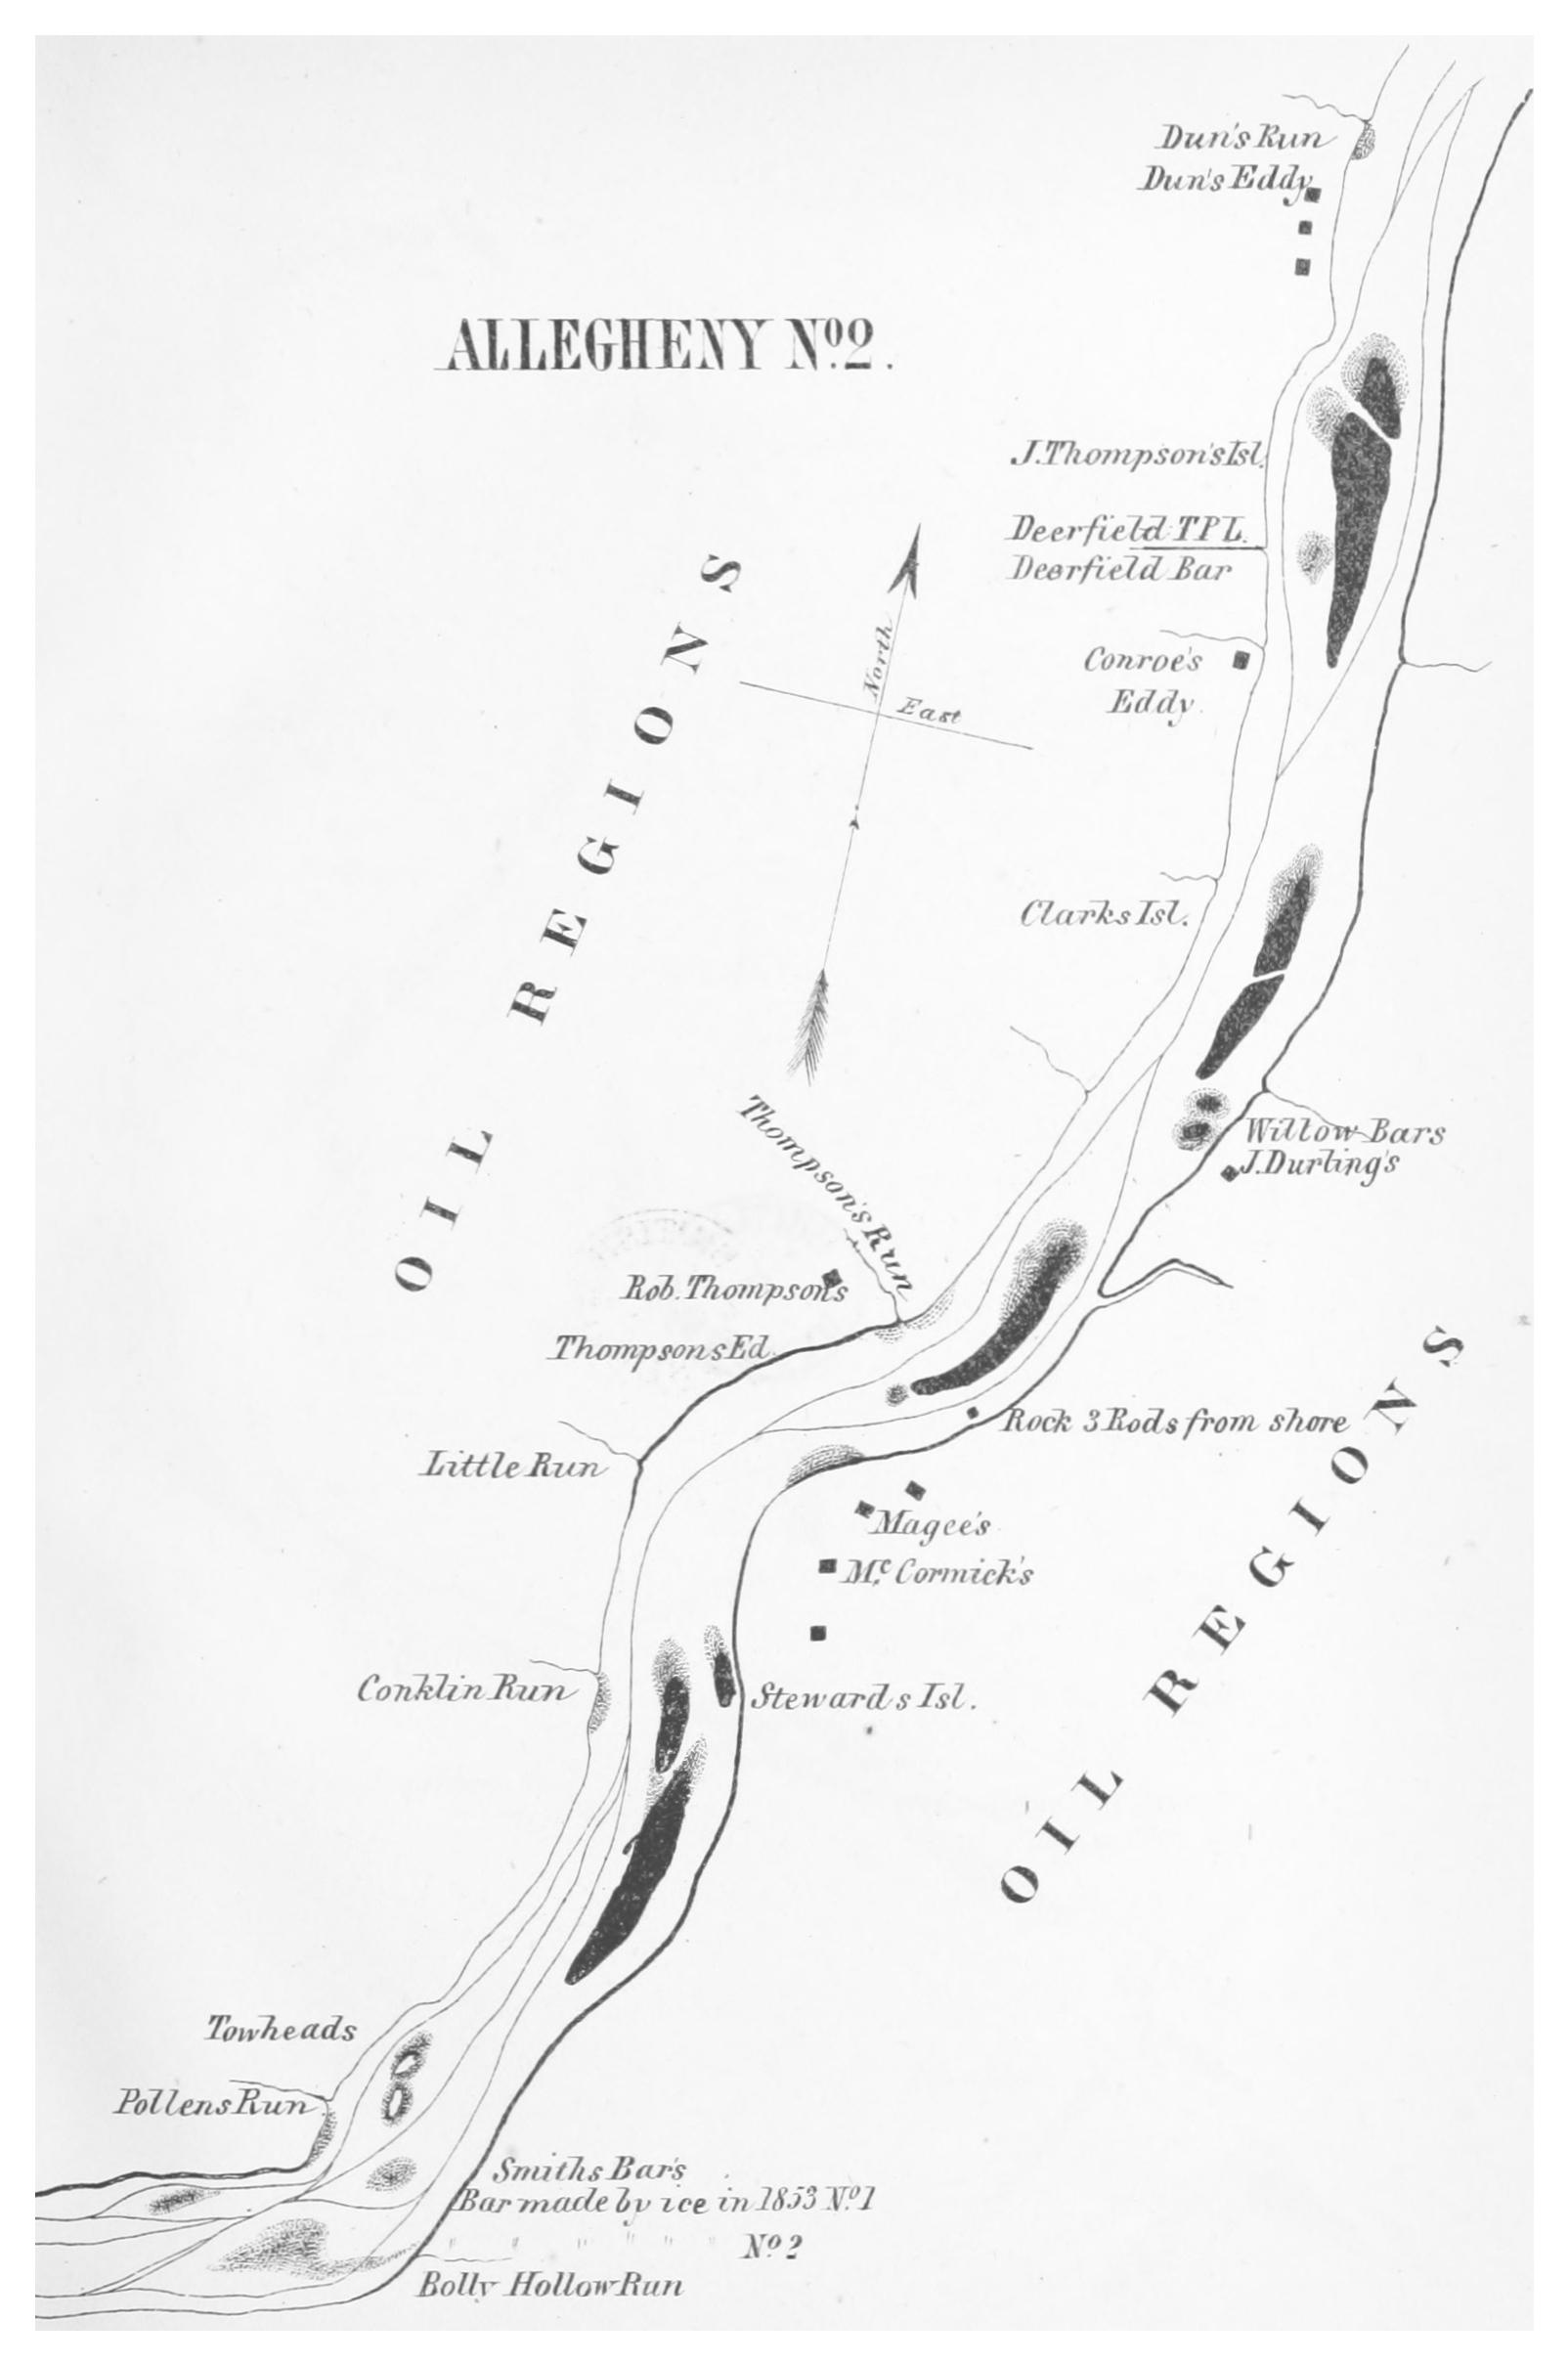 File:GILLELEN(1864) p047 Oil Creek, Allegheny River, Map 2